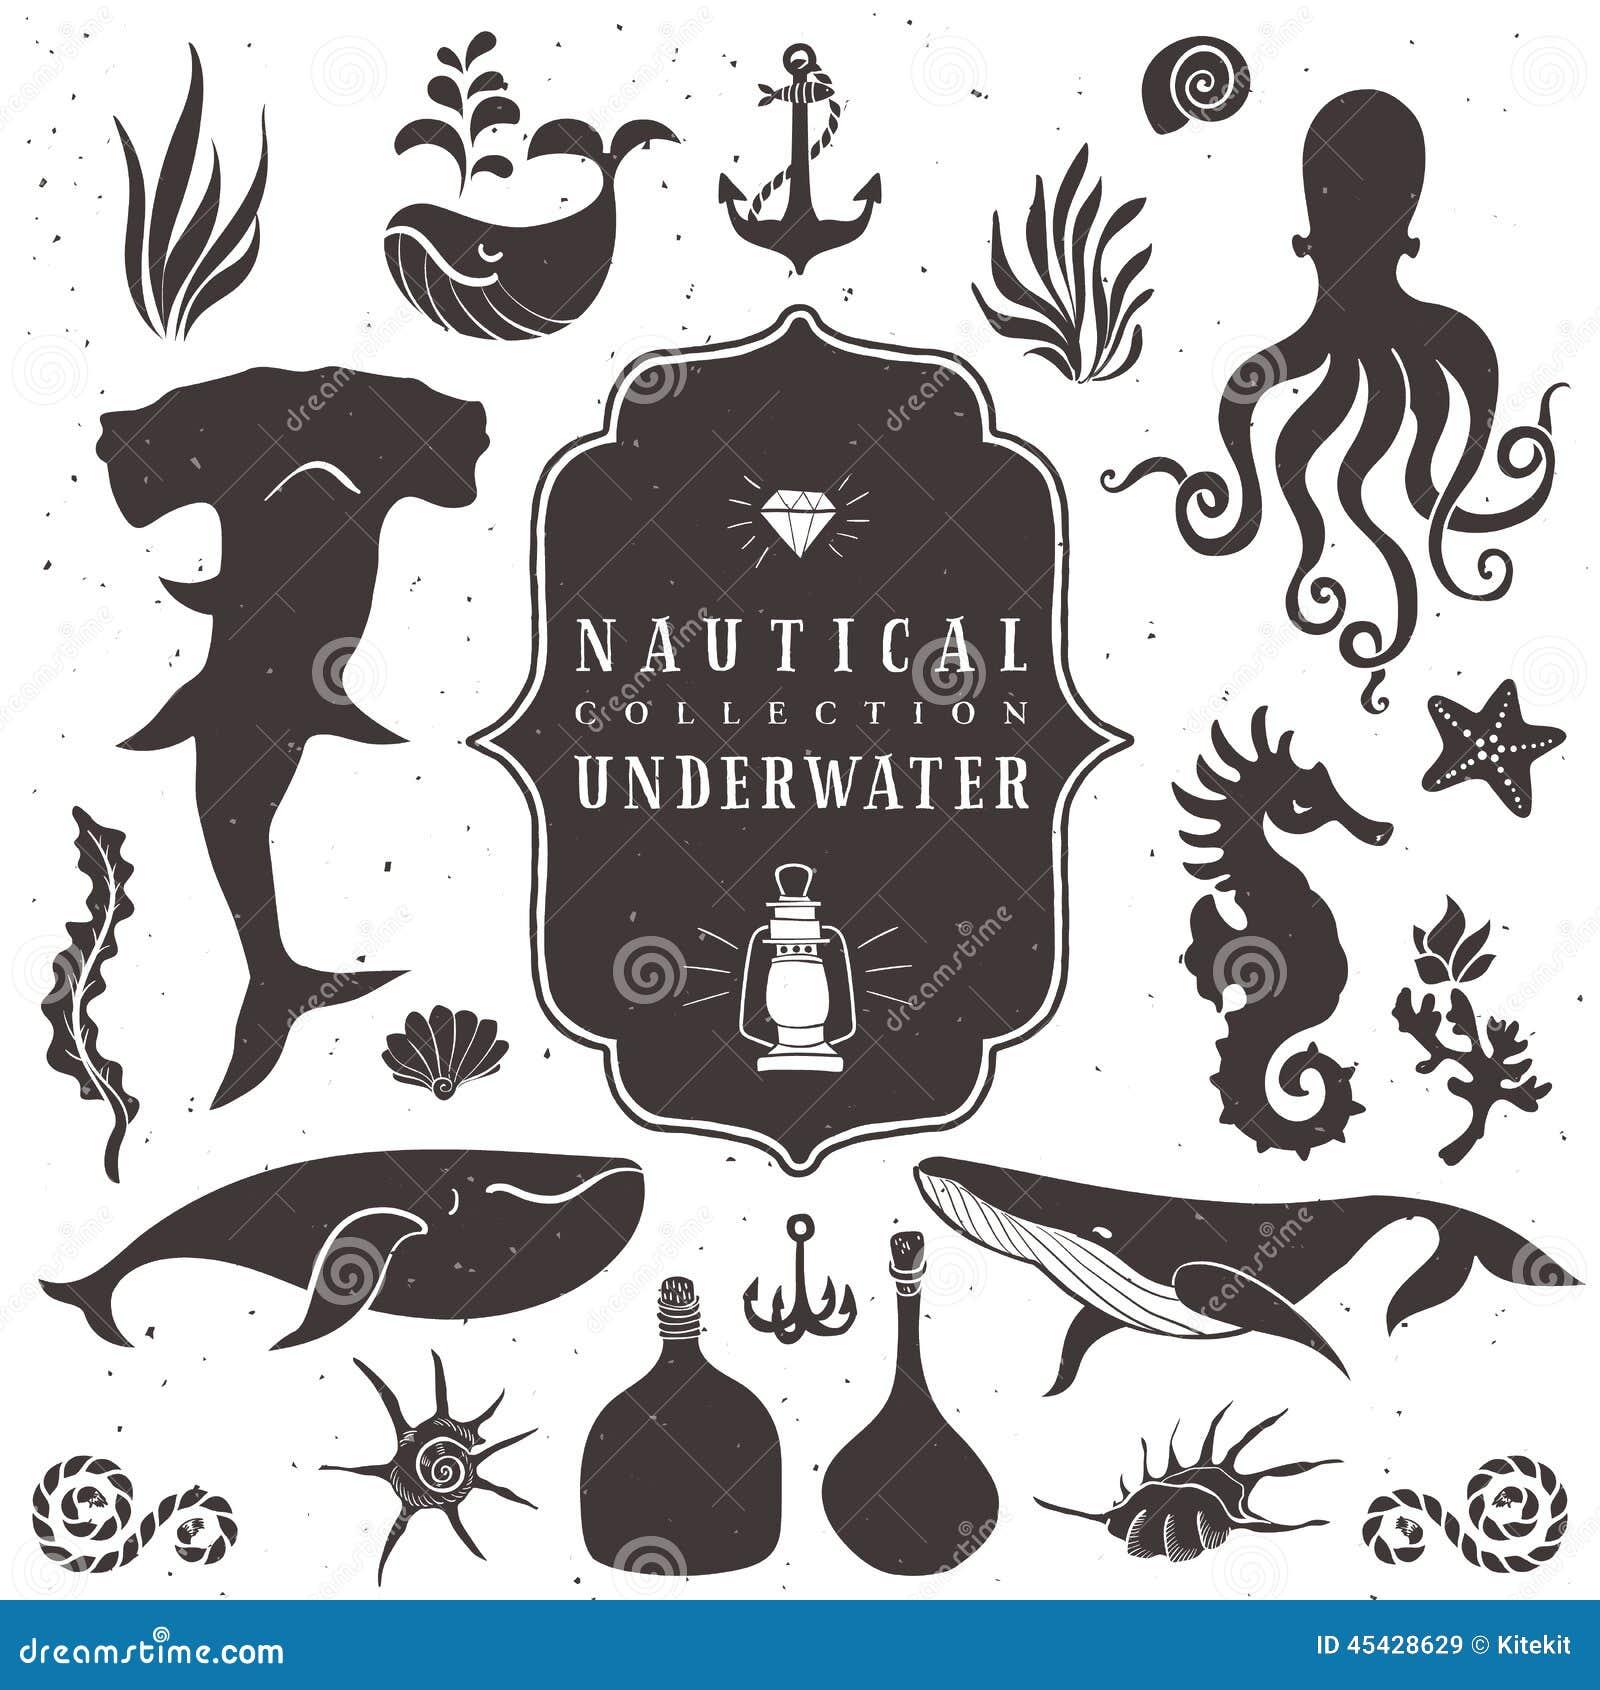 Sea life, marine animals. Vintage hand drawn elements